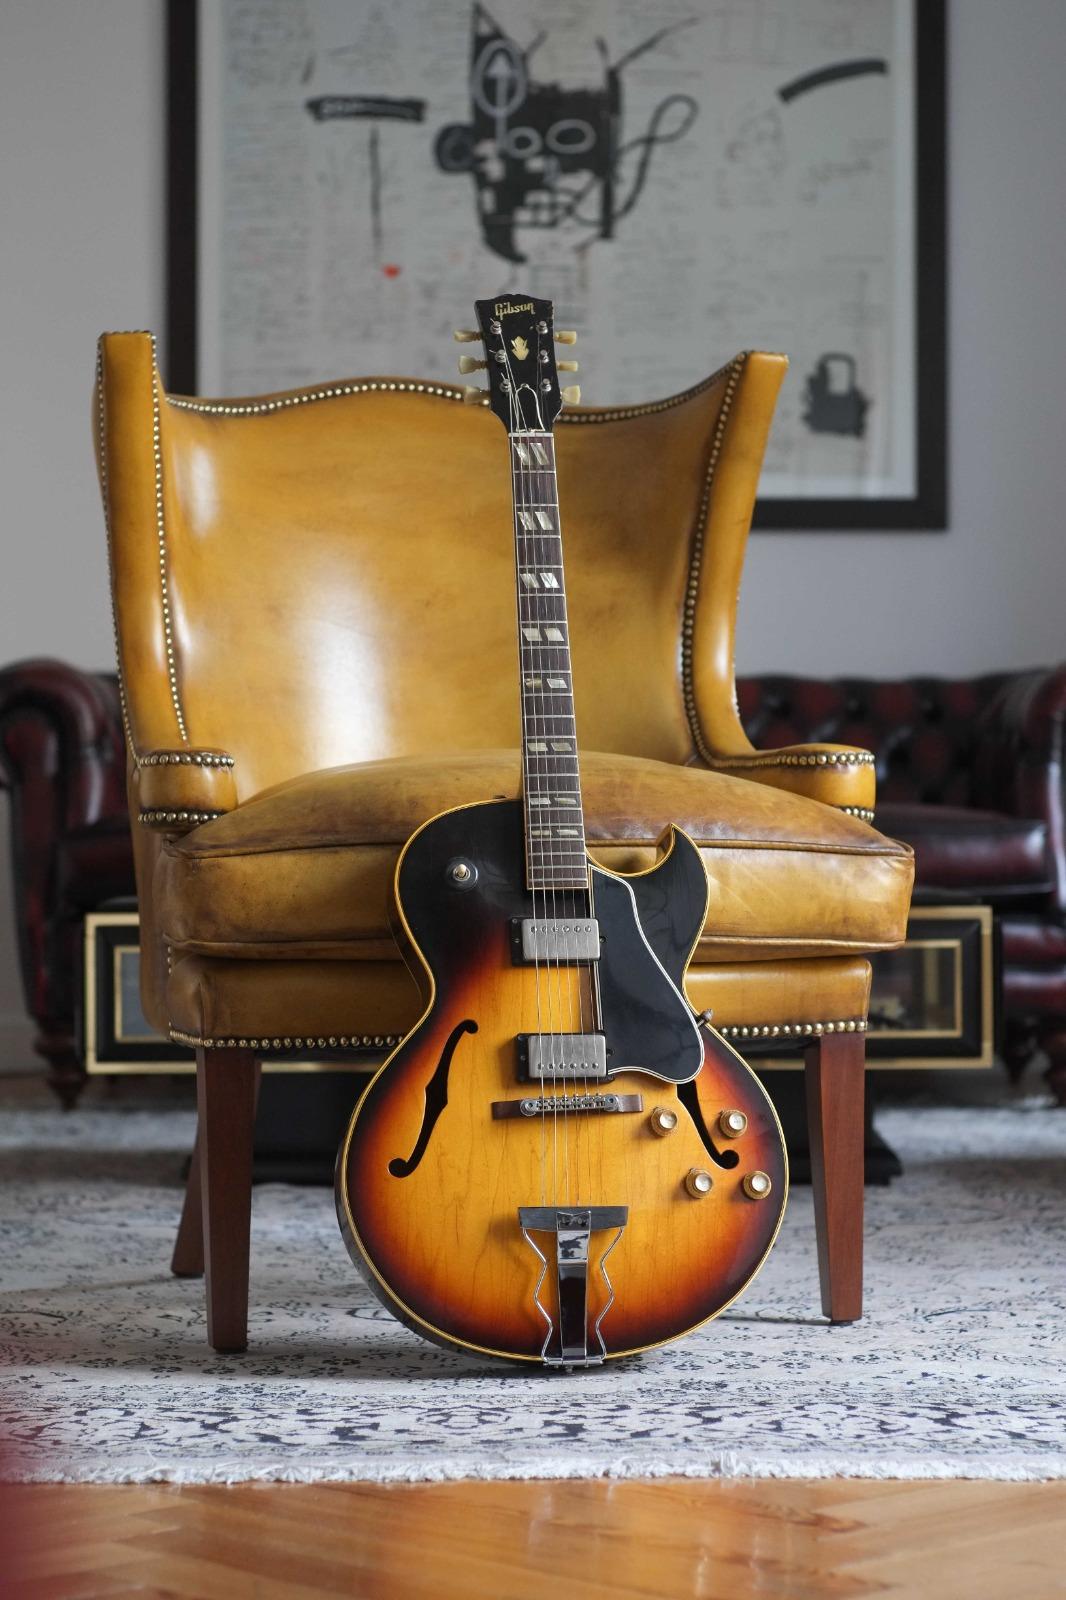 1964 Gibson ES-175-img-20201211-wa0013-jpg